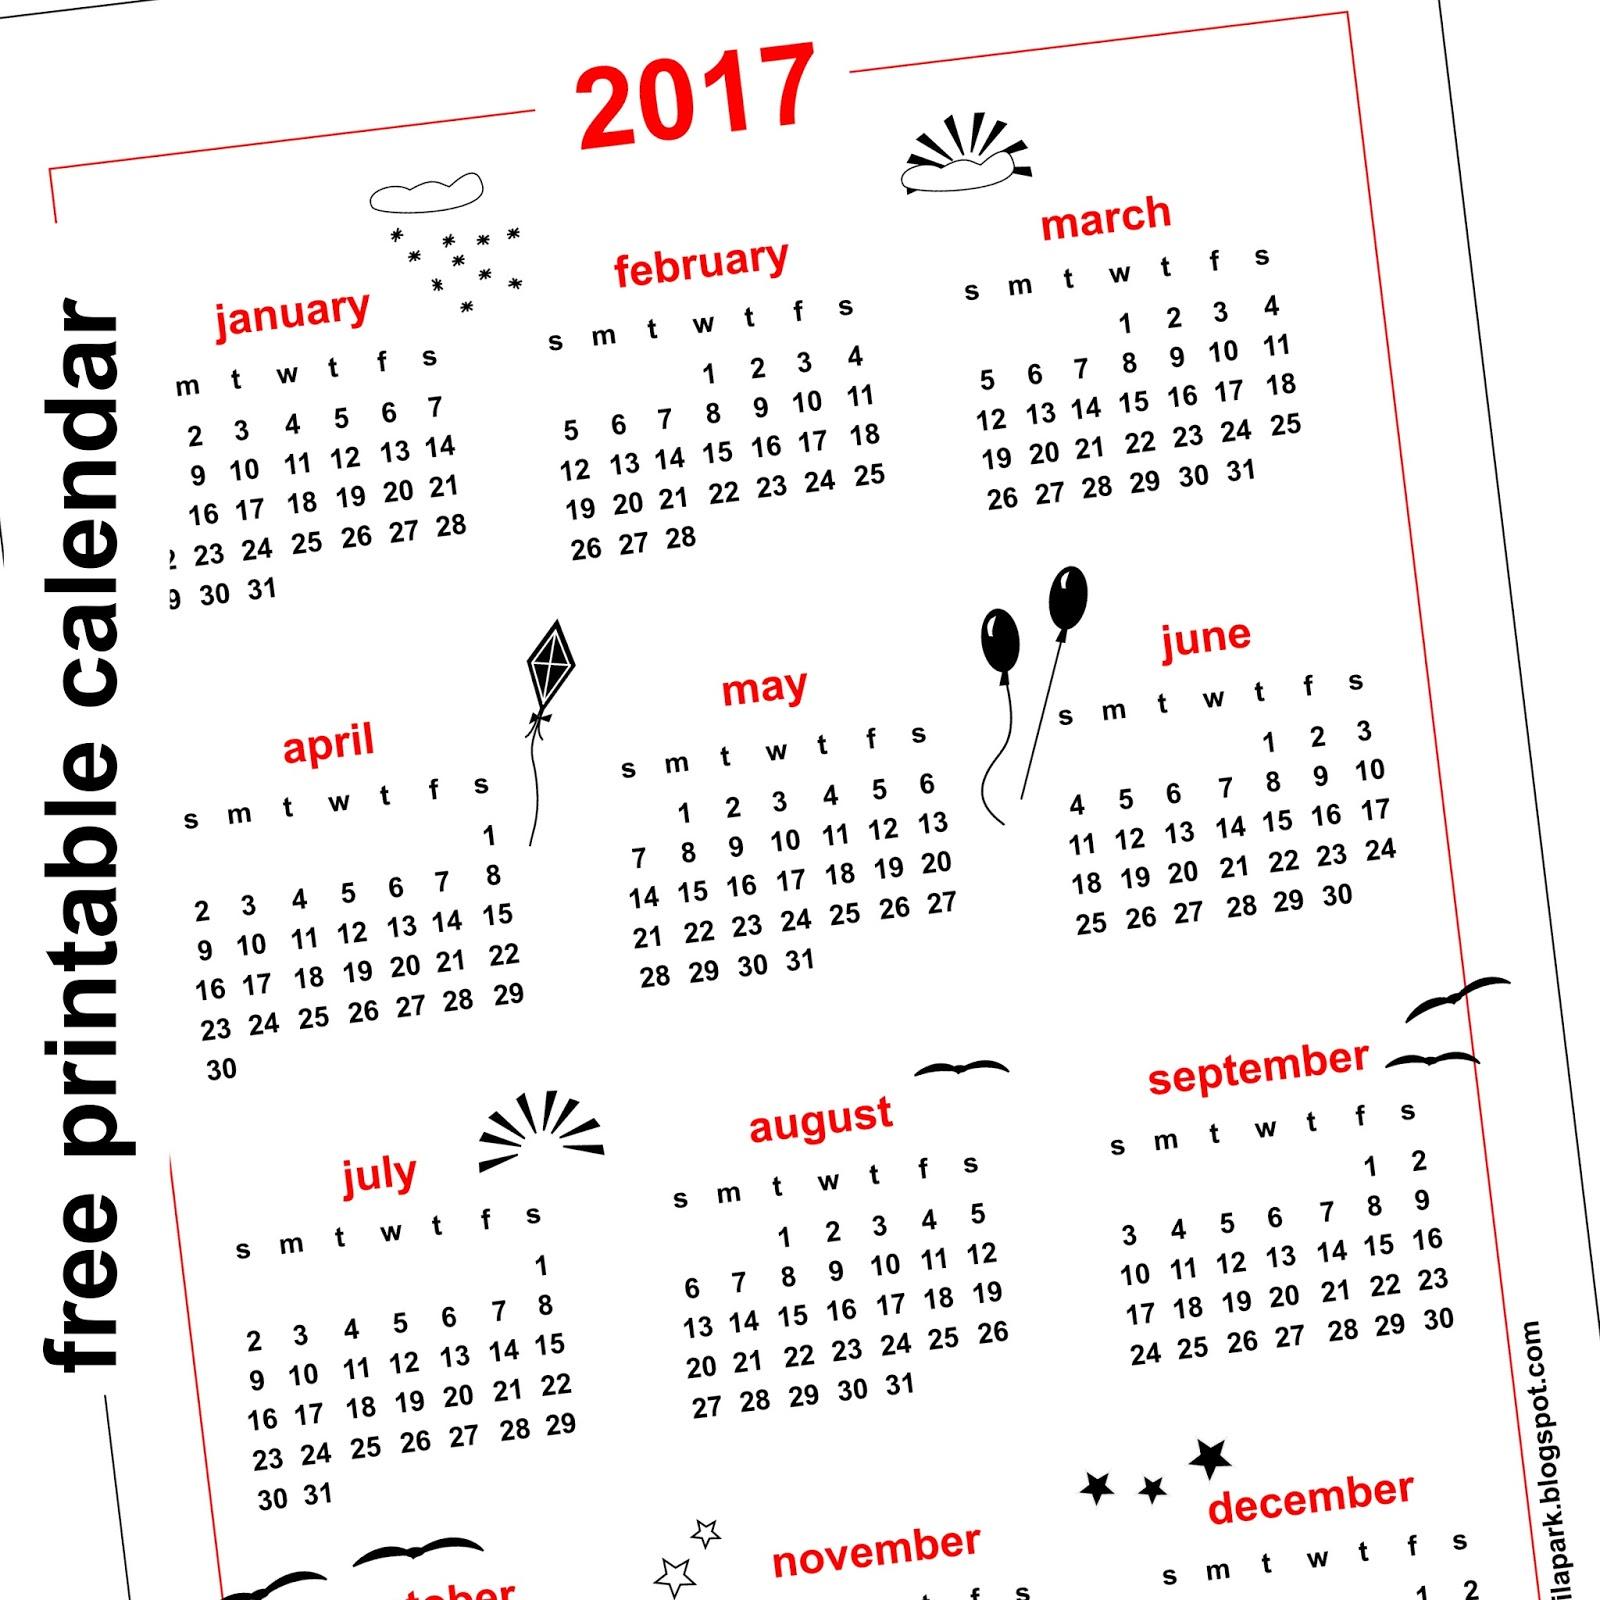 2017 Calendar A5 - Free Calendars 2017